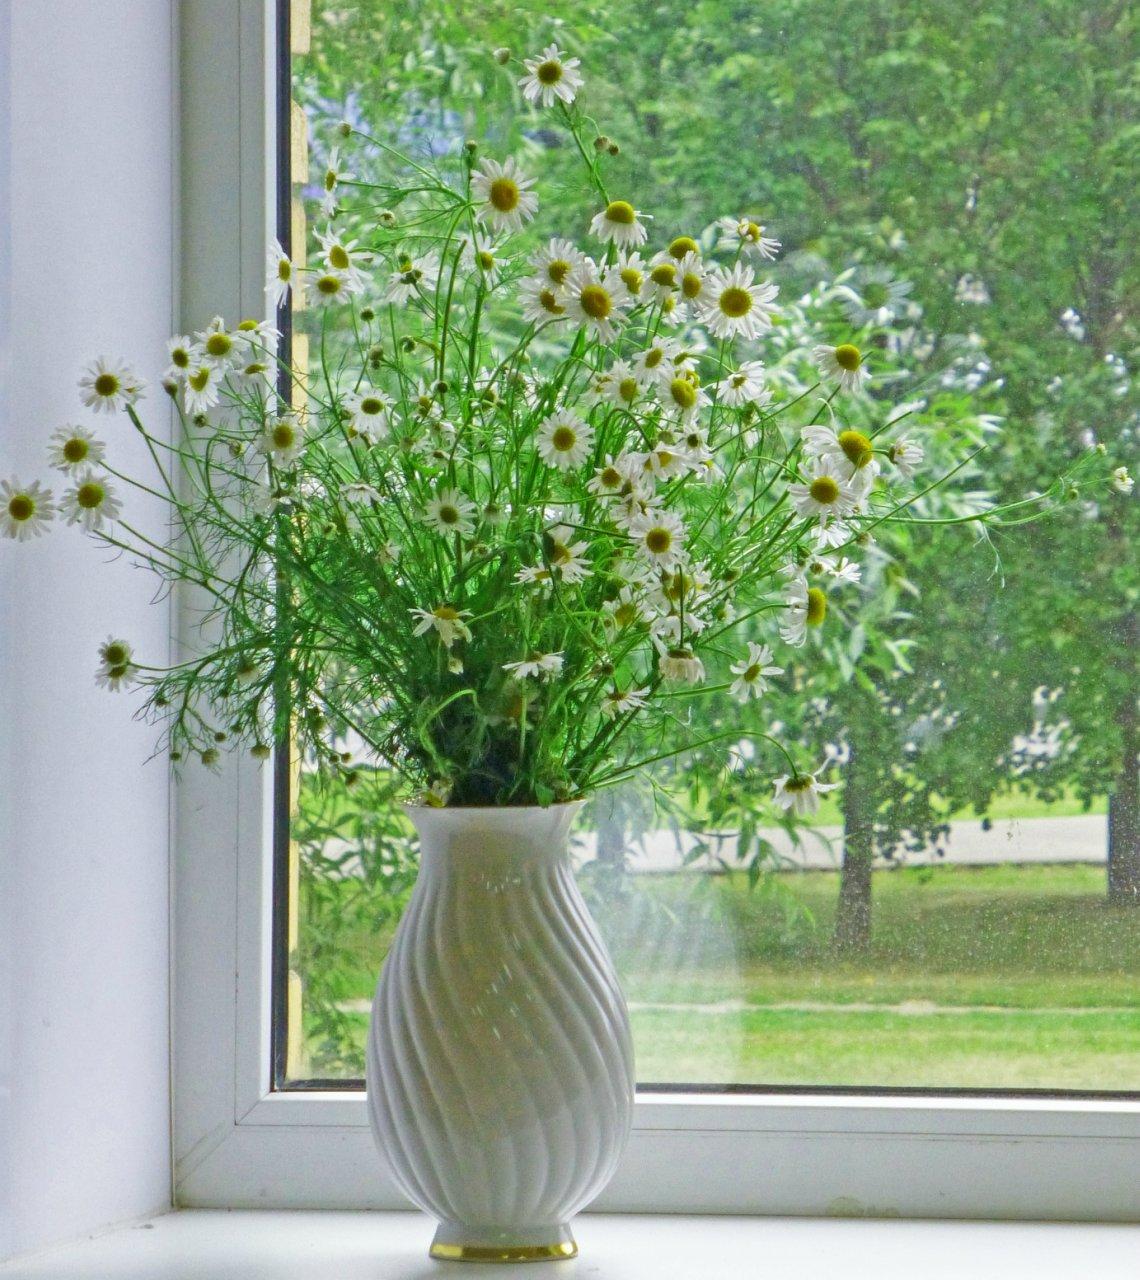 красотка картинка за окном ромашки решение